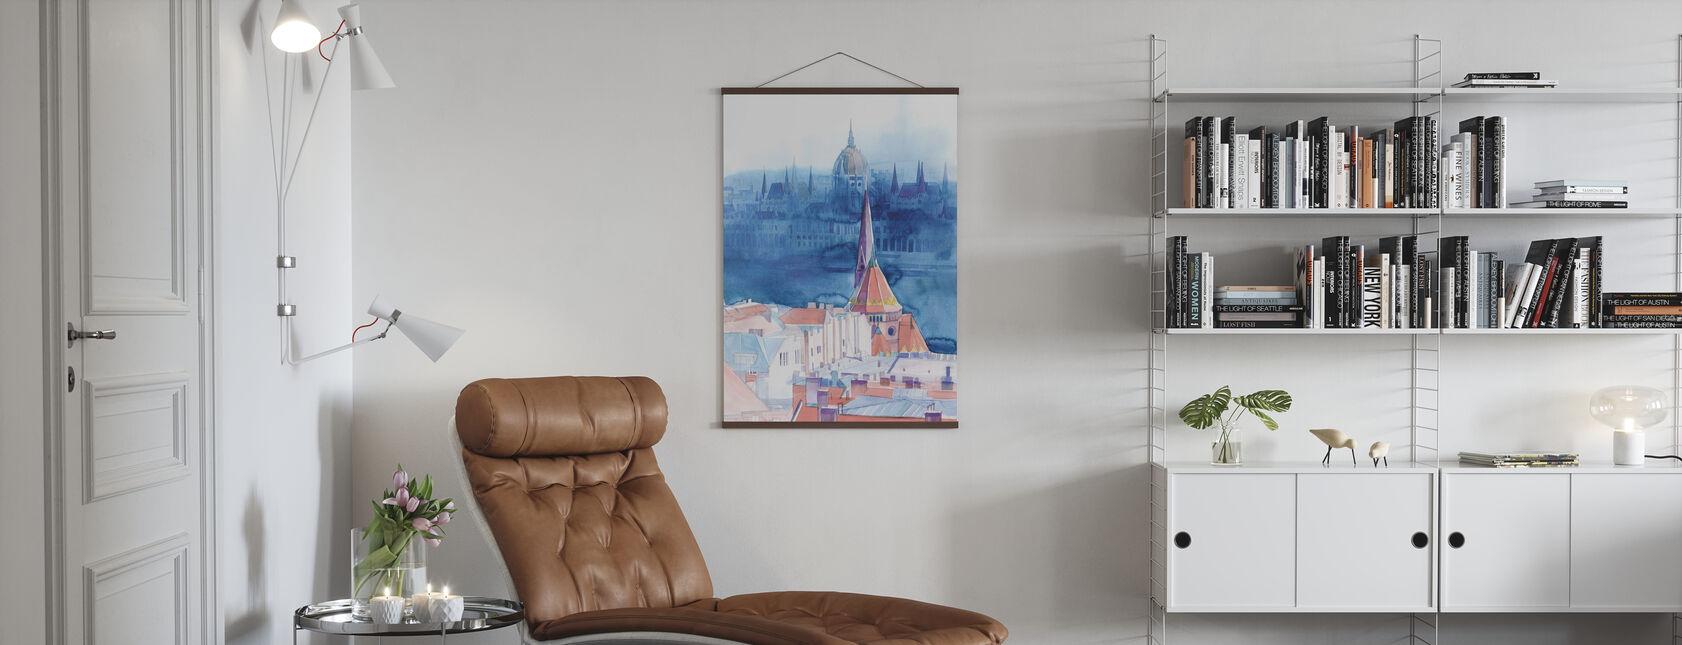 Morning in Budapest - Poster - Living Room